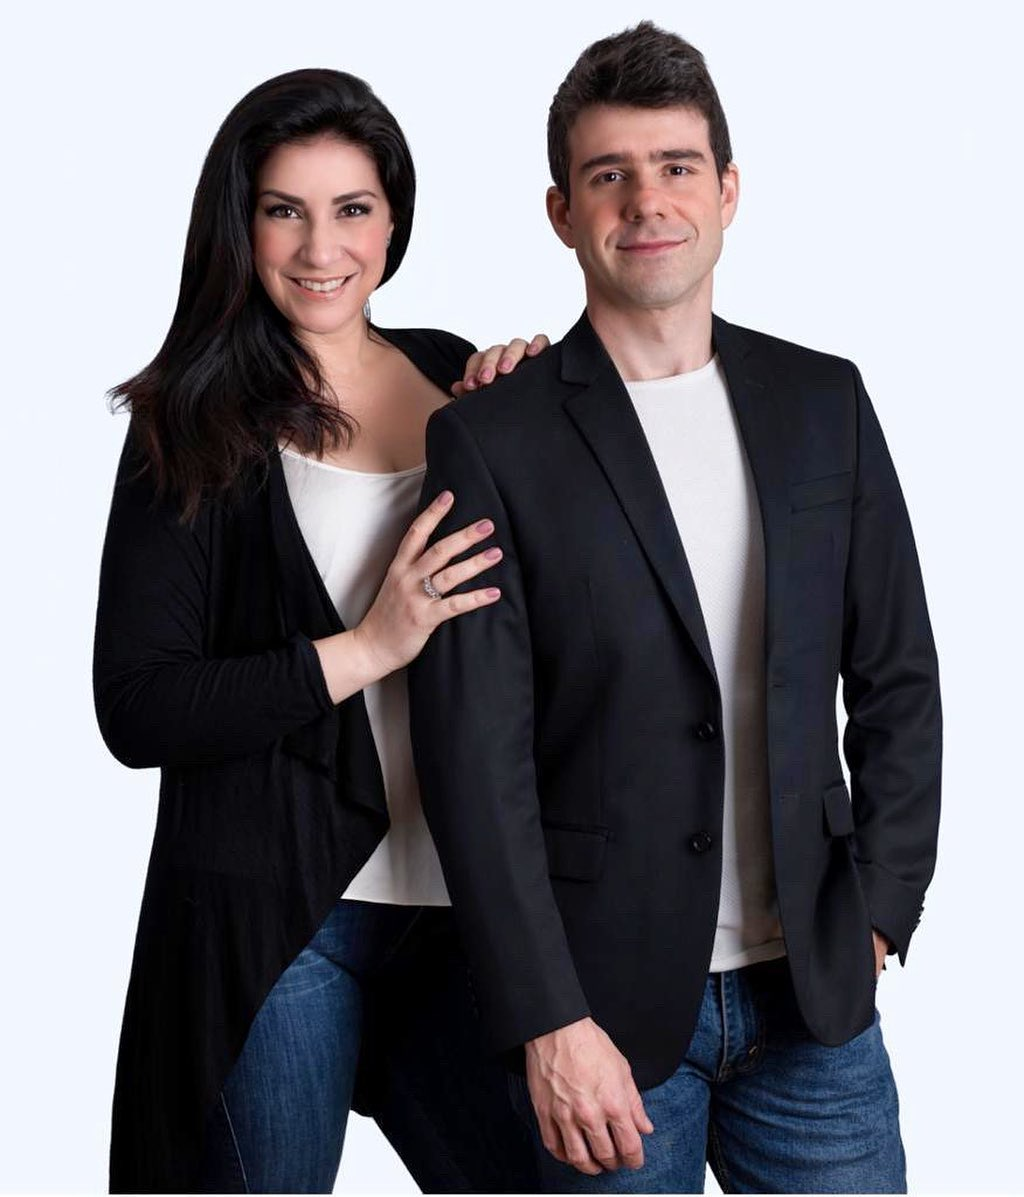 Rachel Rebouças & Rodrigo Mendes